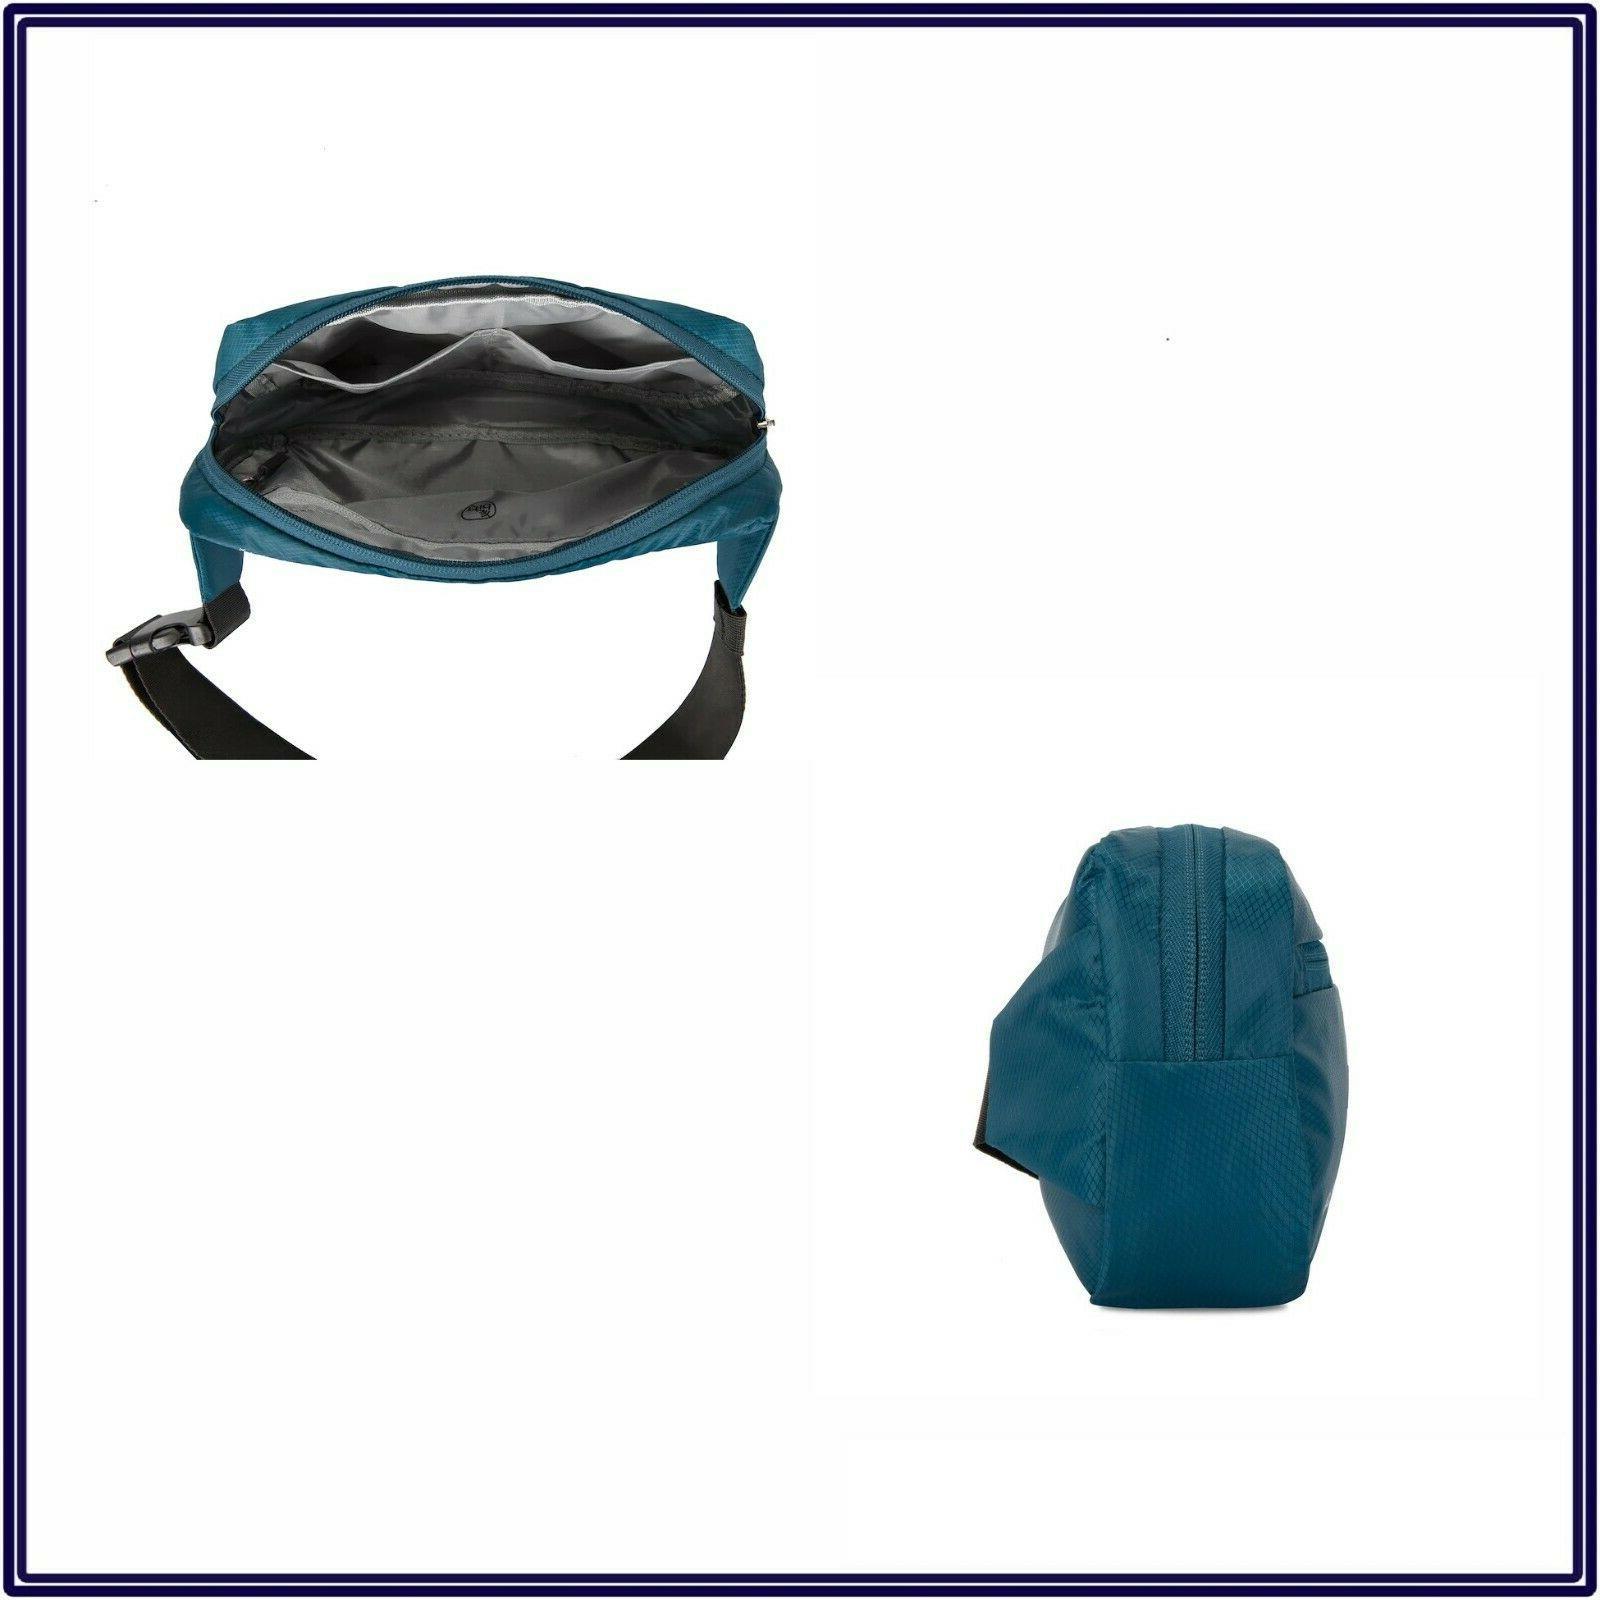 NWT Crossbody Sling Bag in Black Unisex Pouch